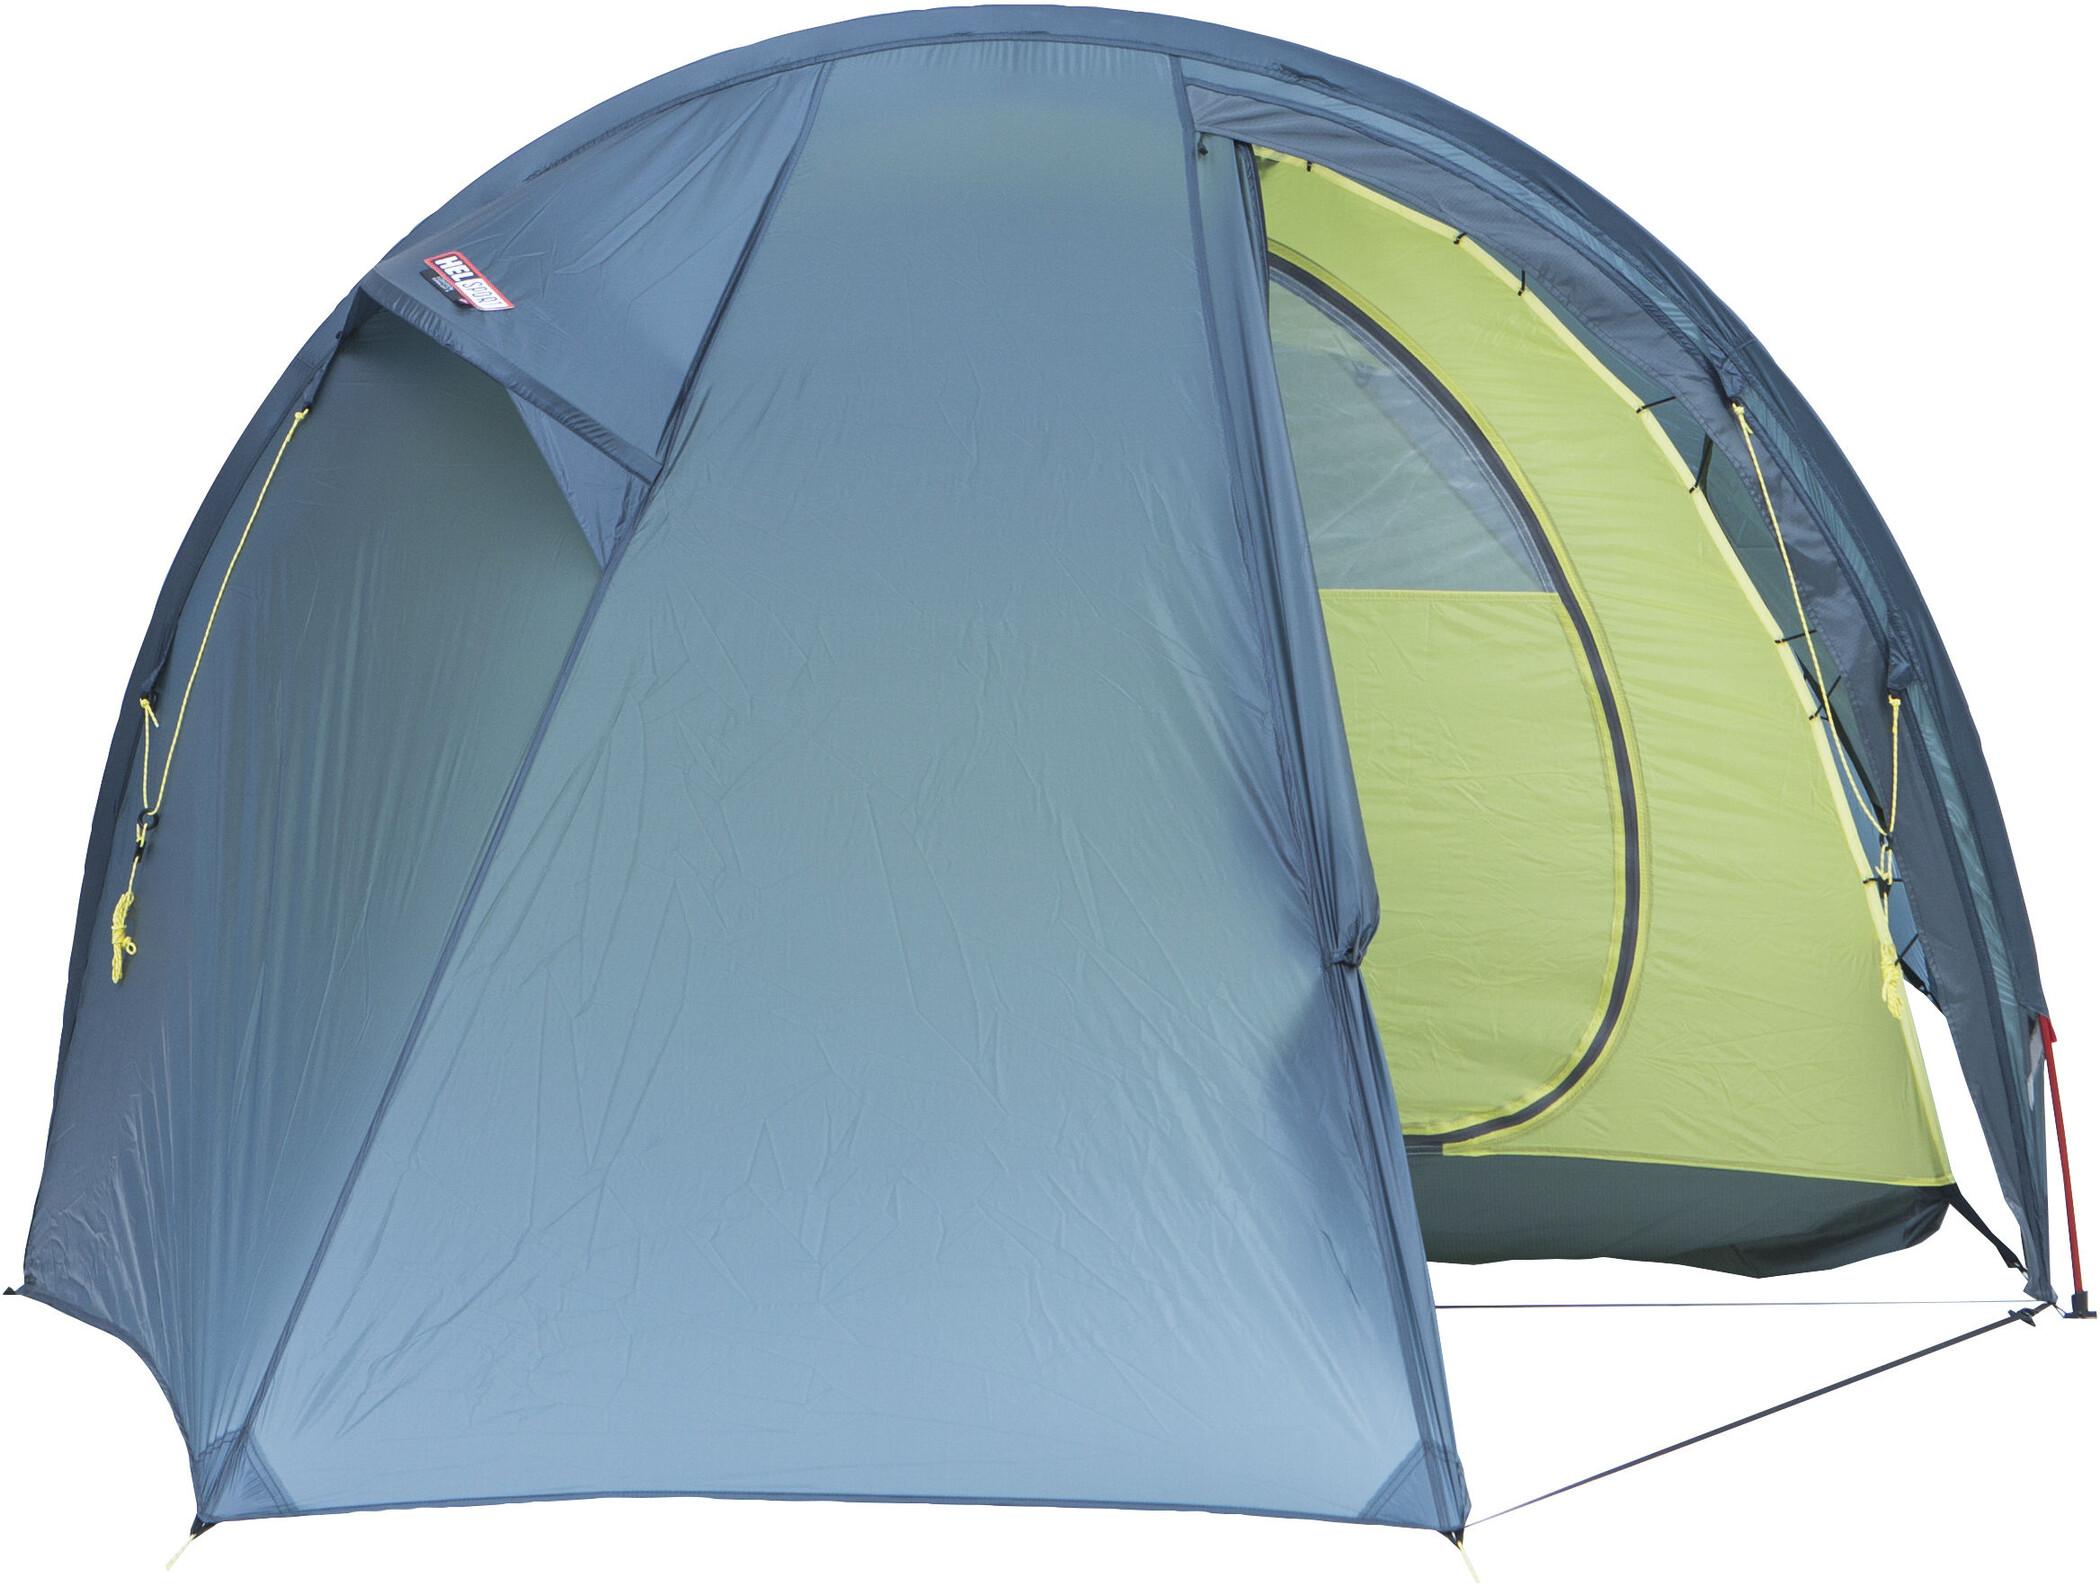 Helsport Lofoten Superlight 2 Zelt kaufen | Bergzeit